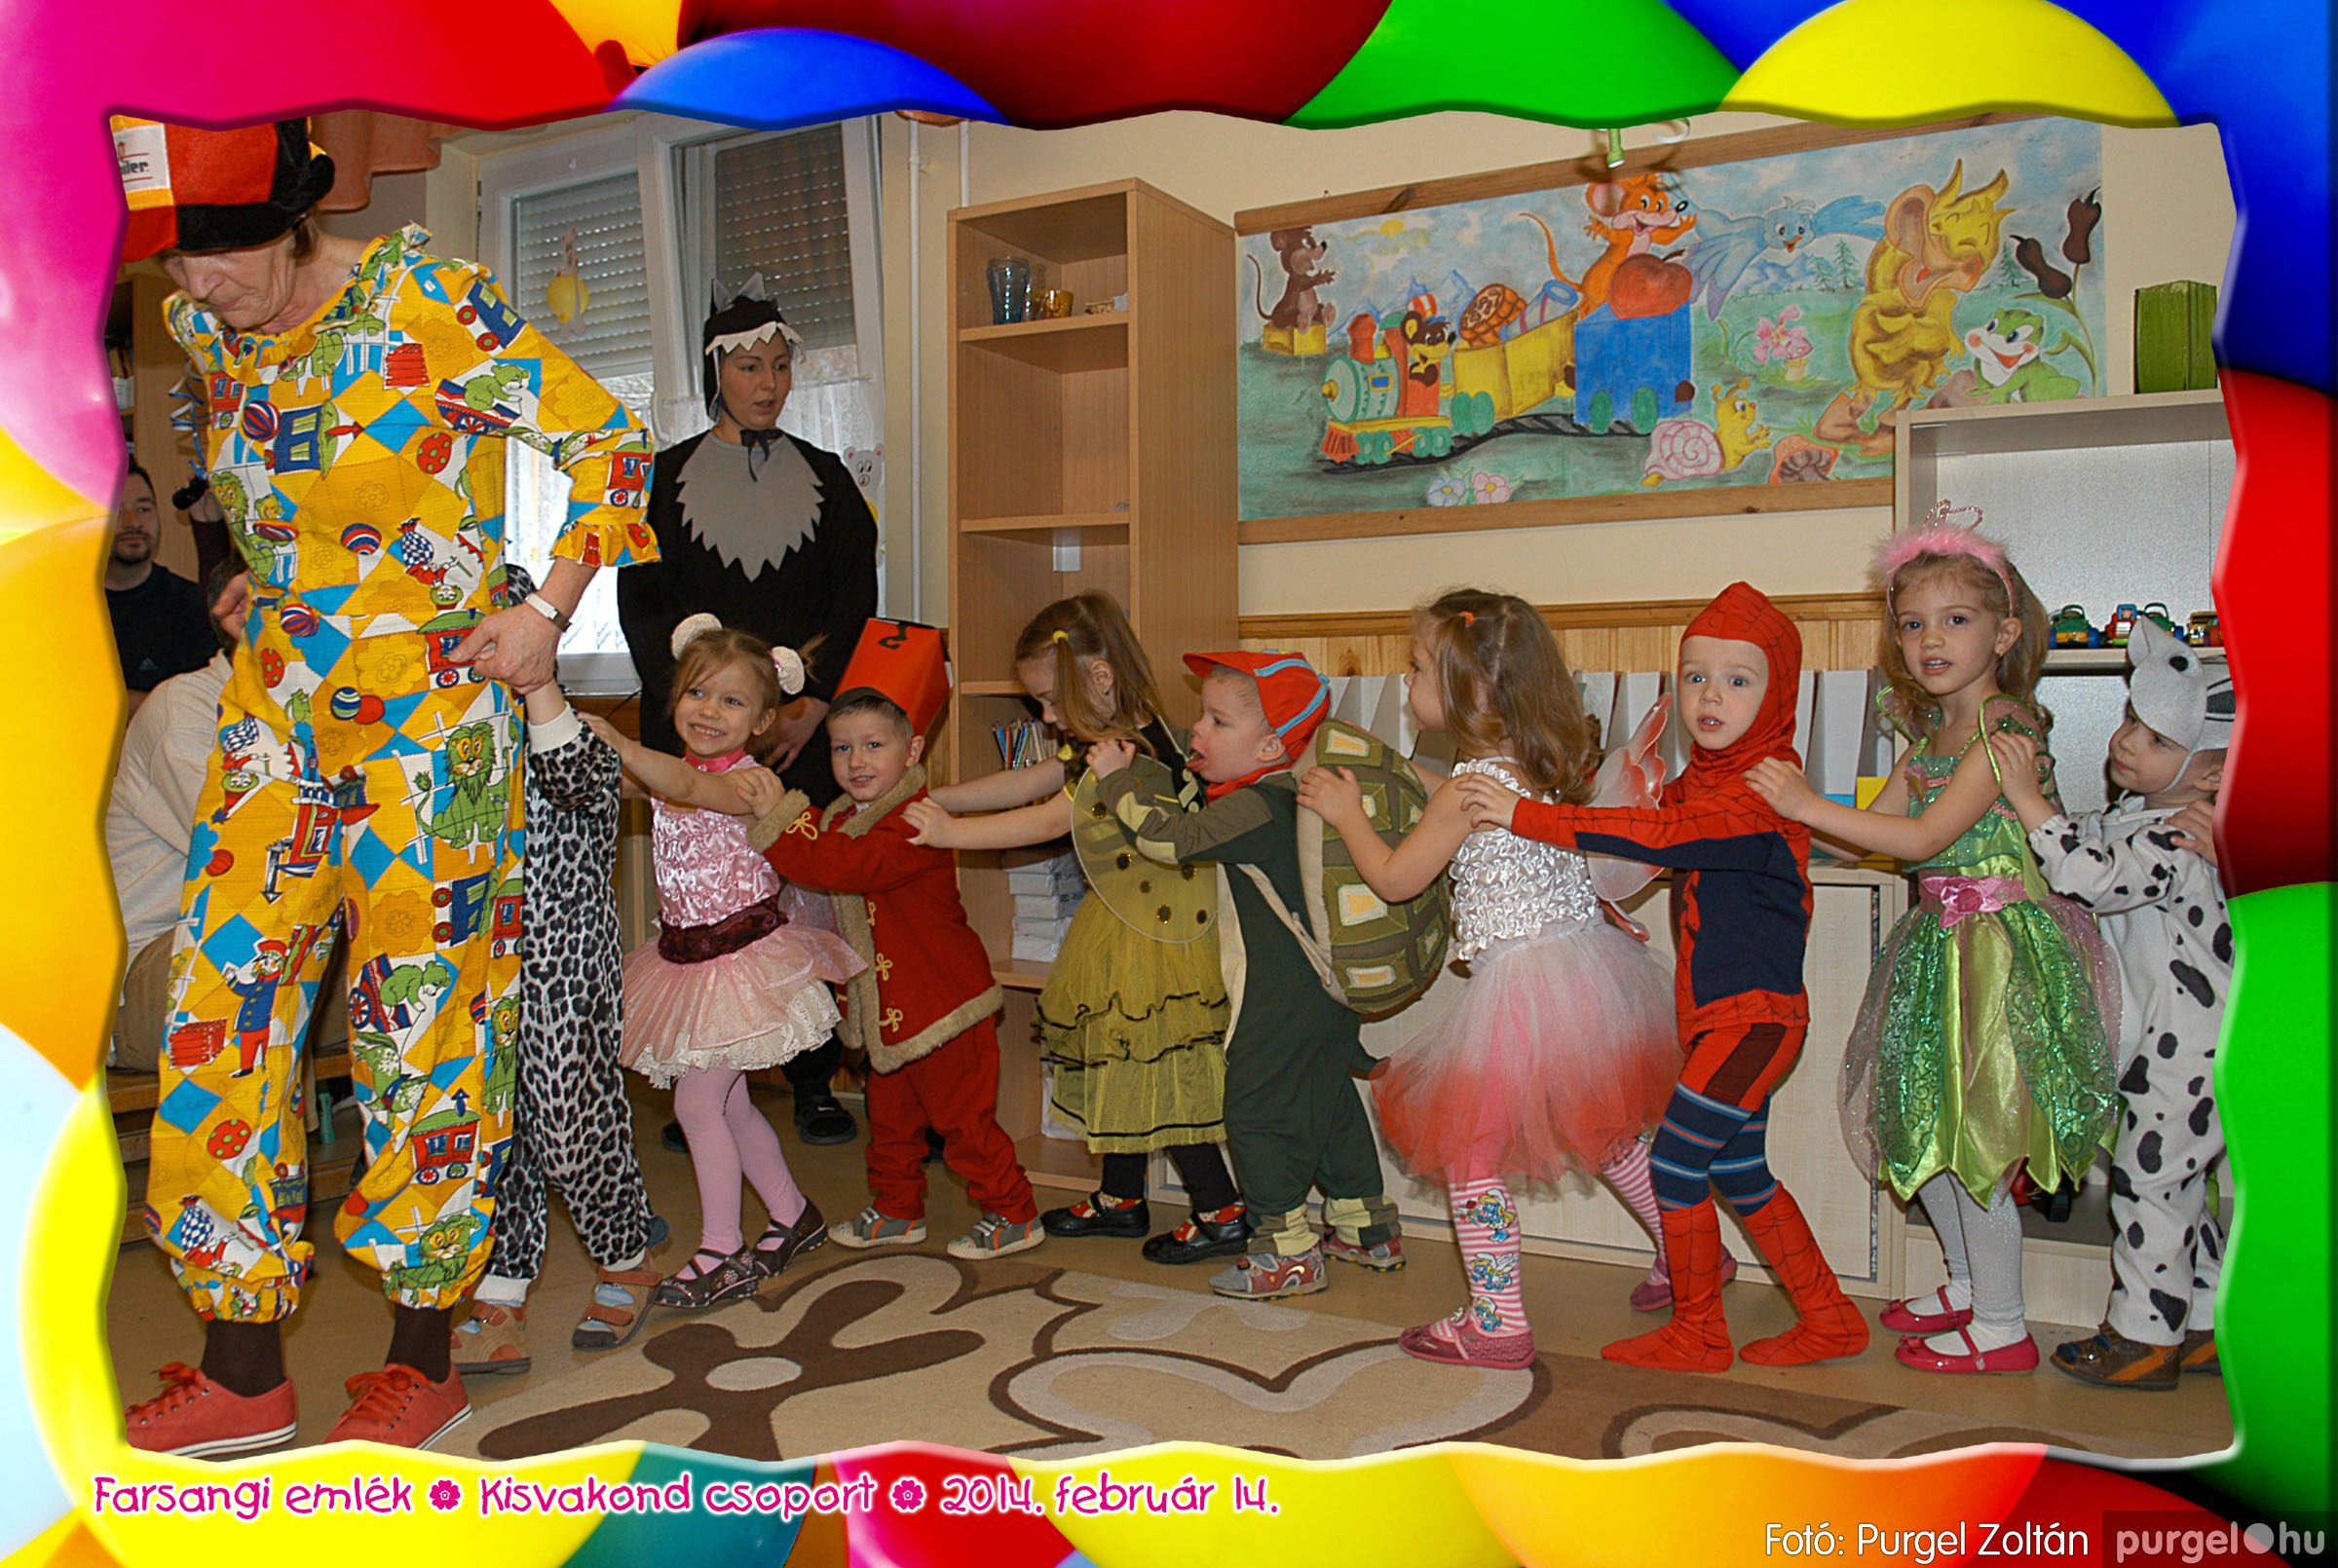 2014.02.14. 192 Kurca-parti Óvoda farsang 2014. - Kisvakond csoport - Fotó:PURGEL ZOLTÁN© 412.jpg